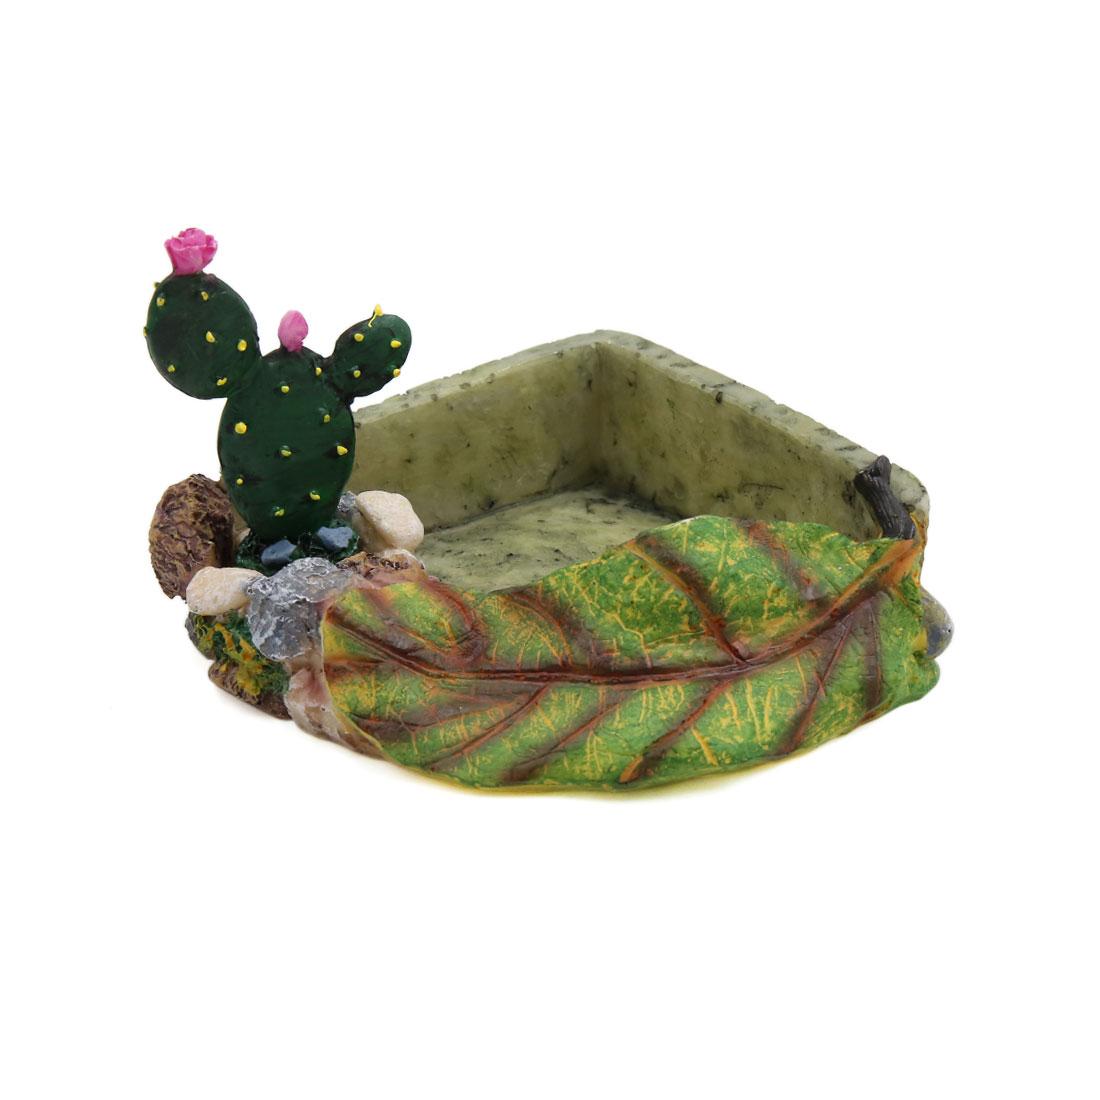 2pcs Resin Corner Bowl Reptiles Feeding Water Food Dish Terrarium Decor Rock - image 1 de 5